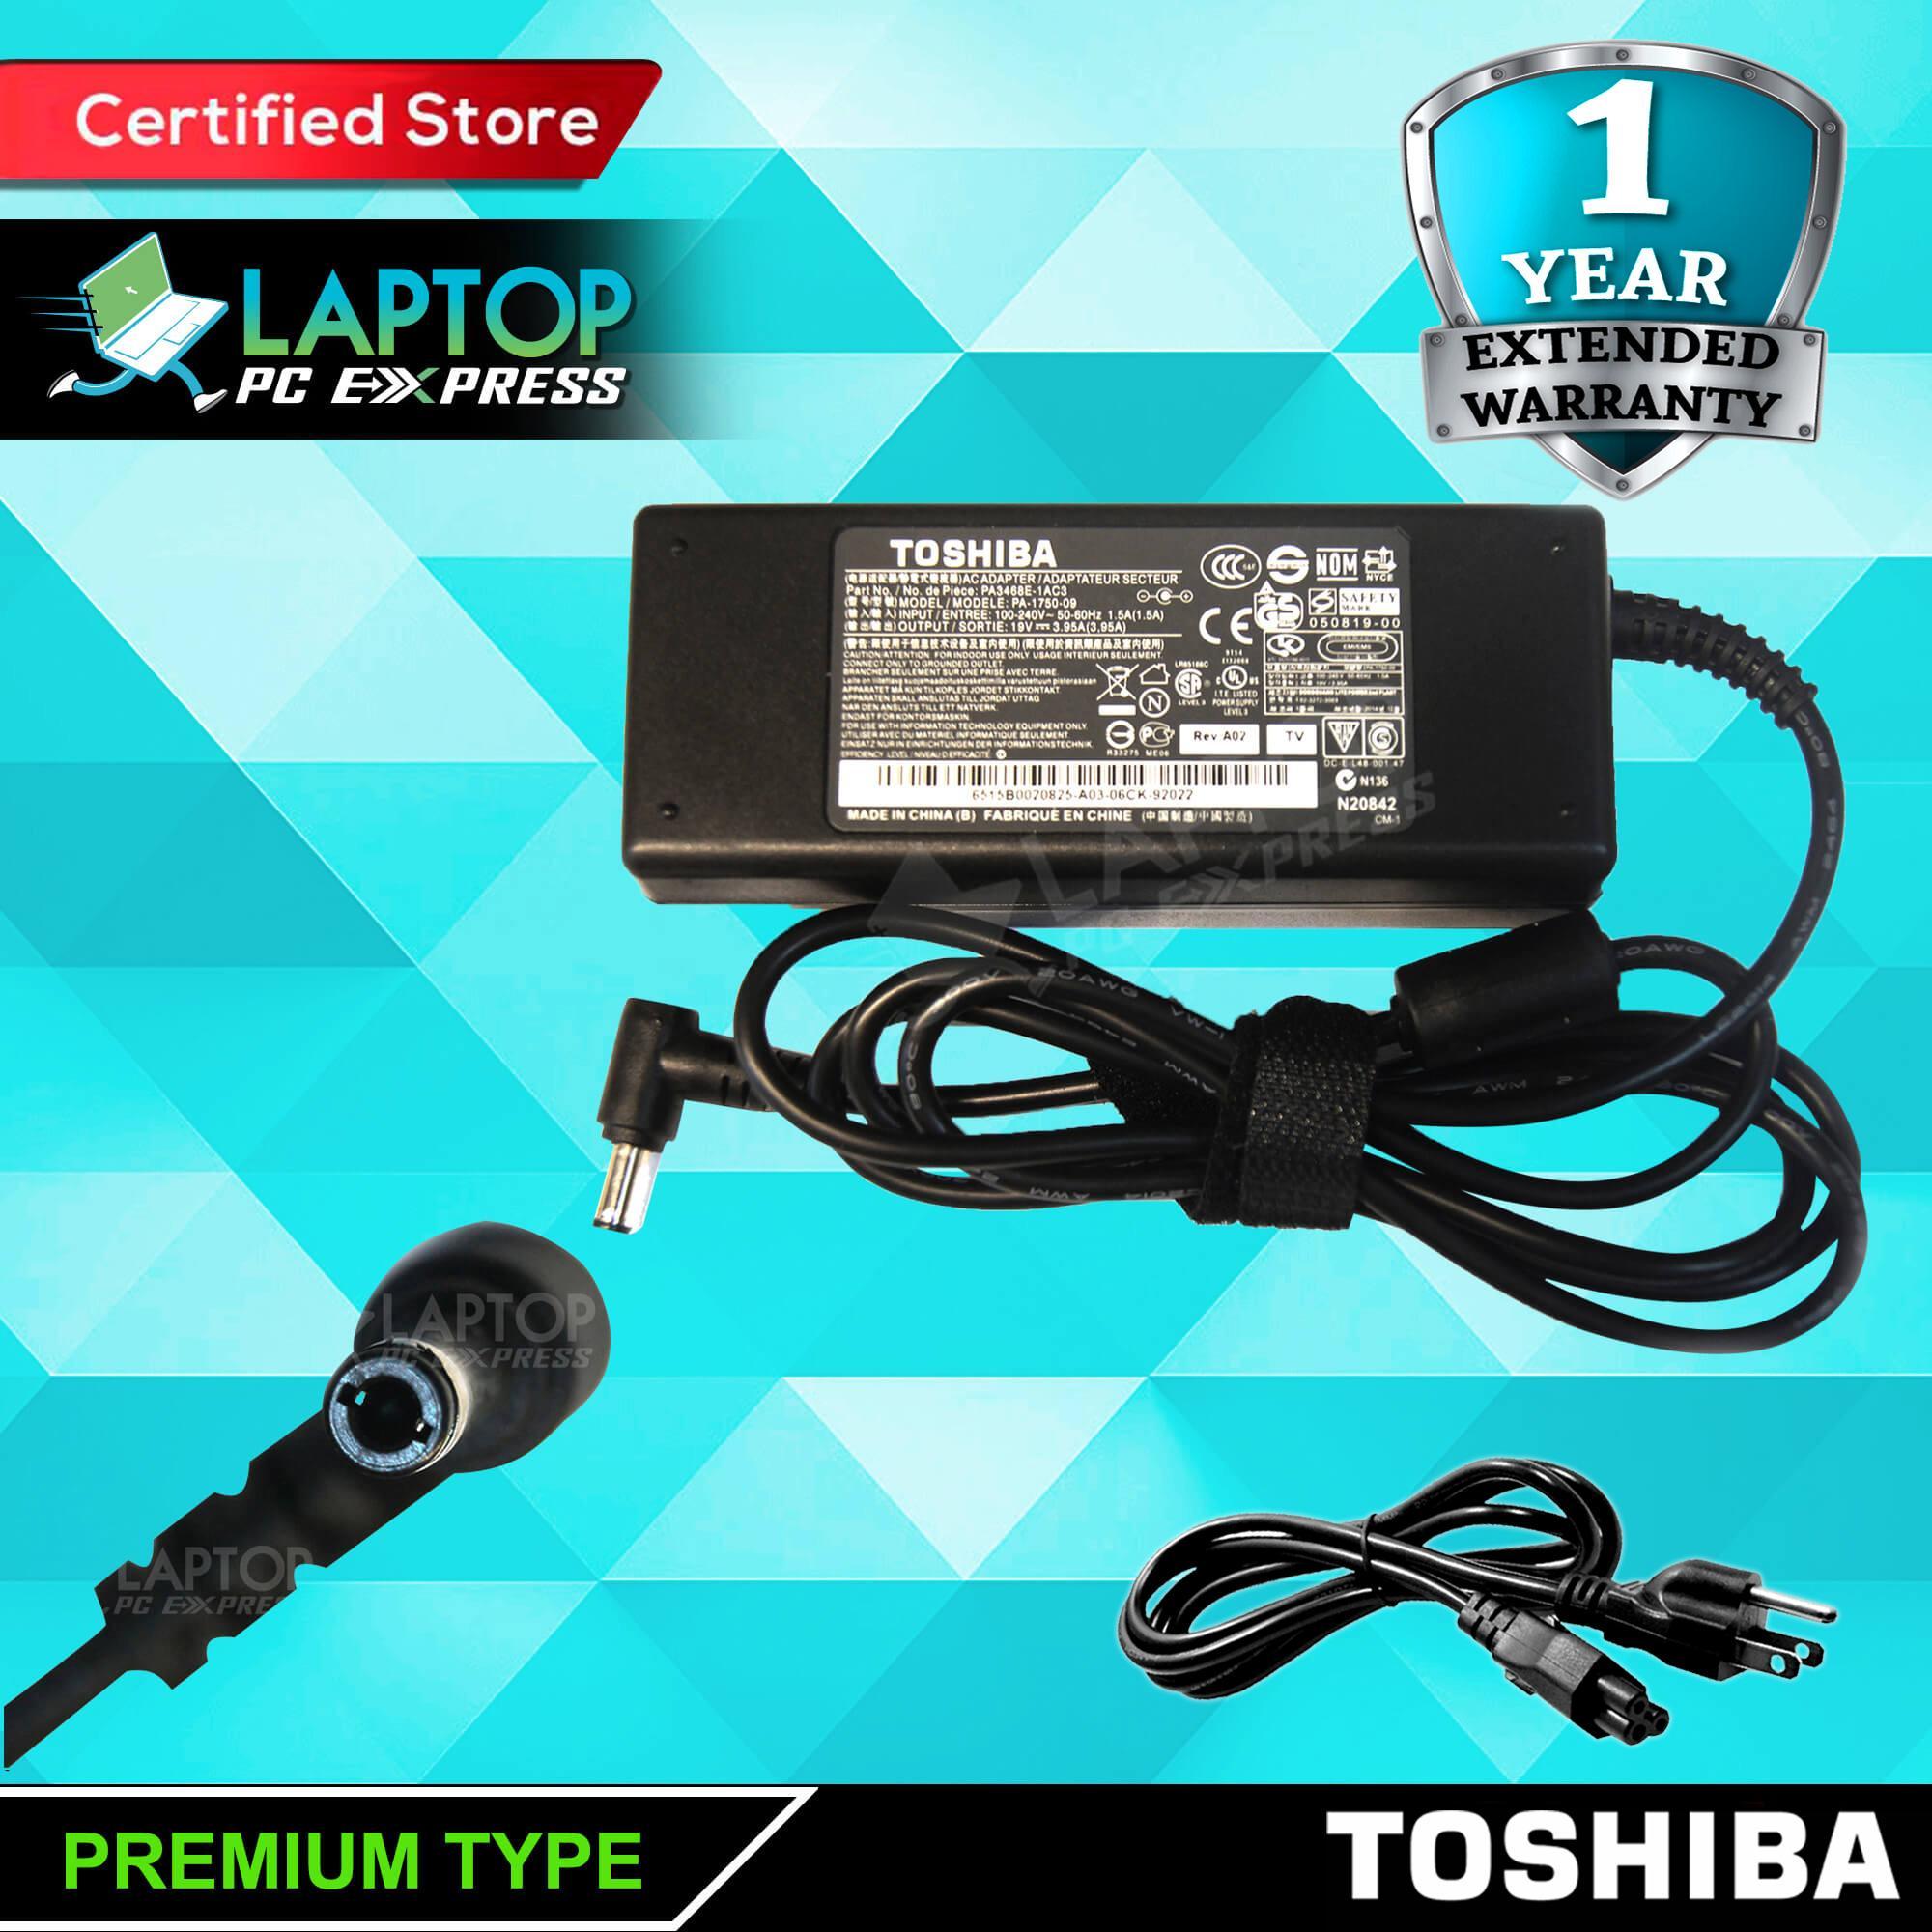 TOSHIBA SATELLITE 1130-S156 LAN DRIVERS FOR WINDOWS MAC